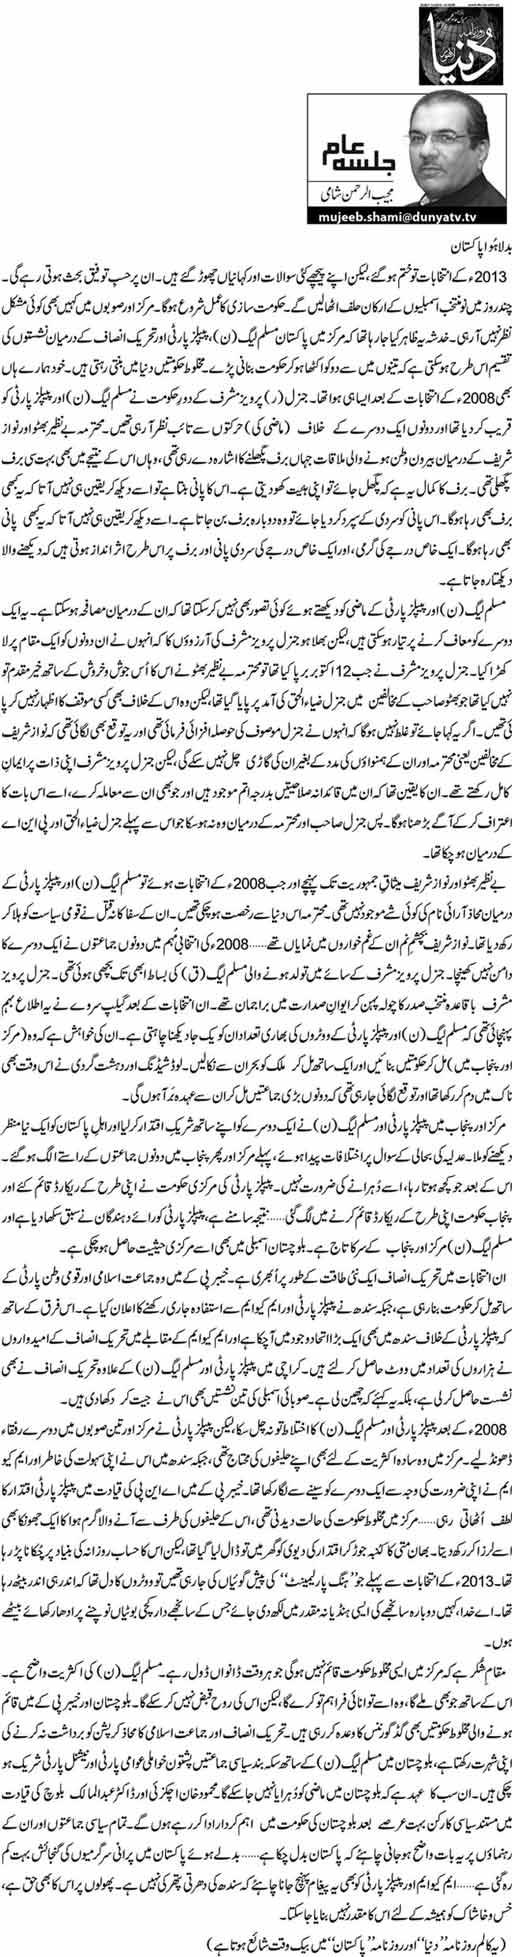 Badla Hwa Pakistan - Mujeeb ur Rehman Shami